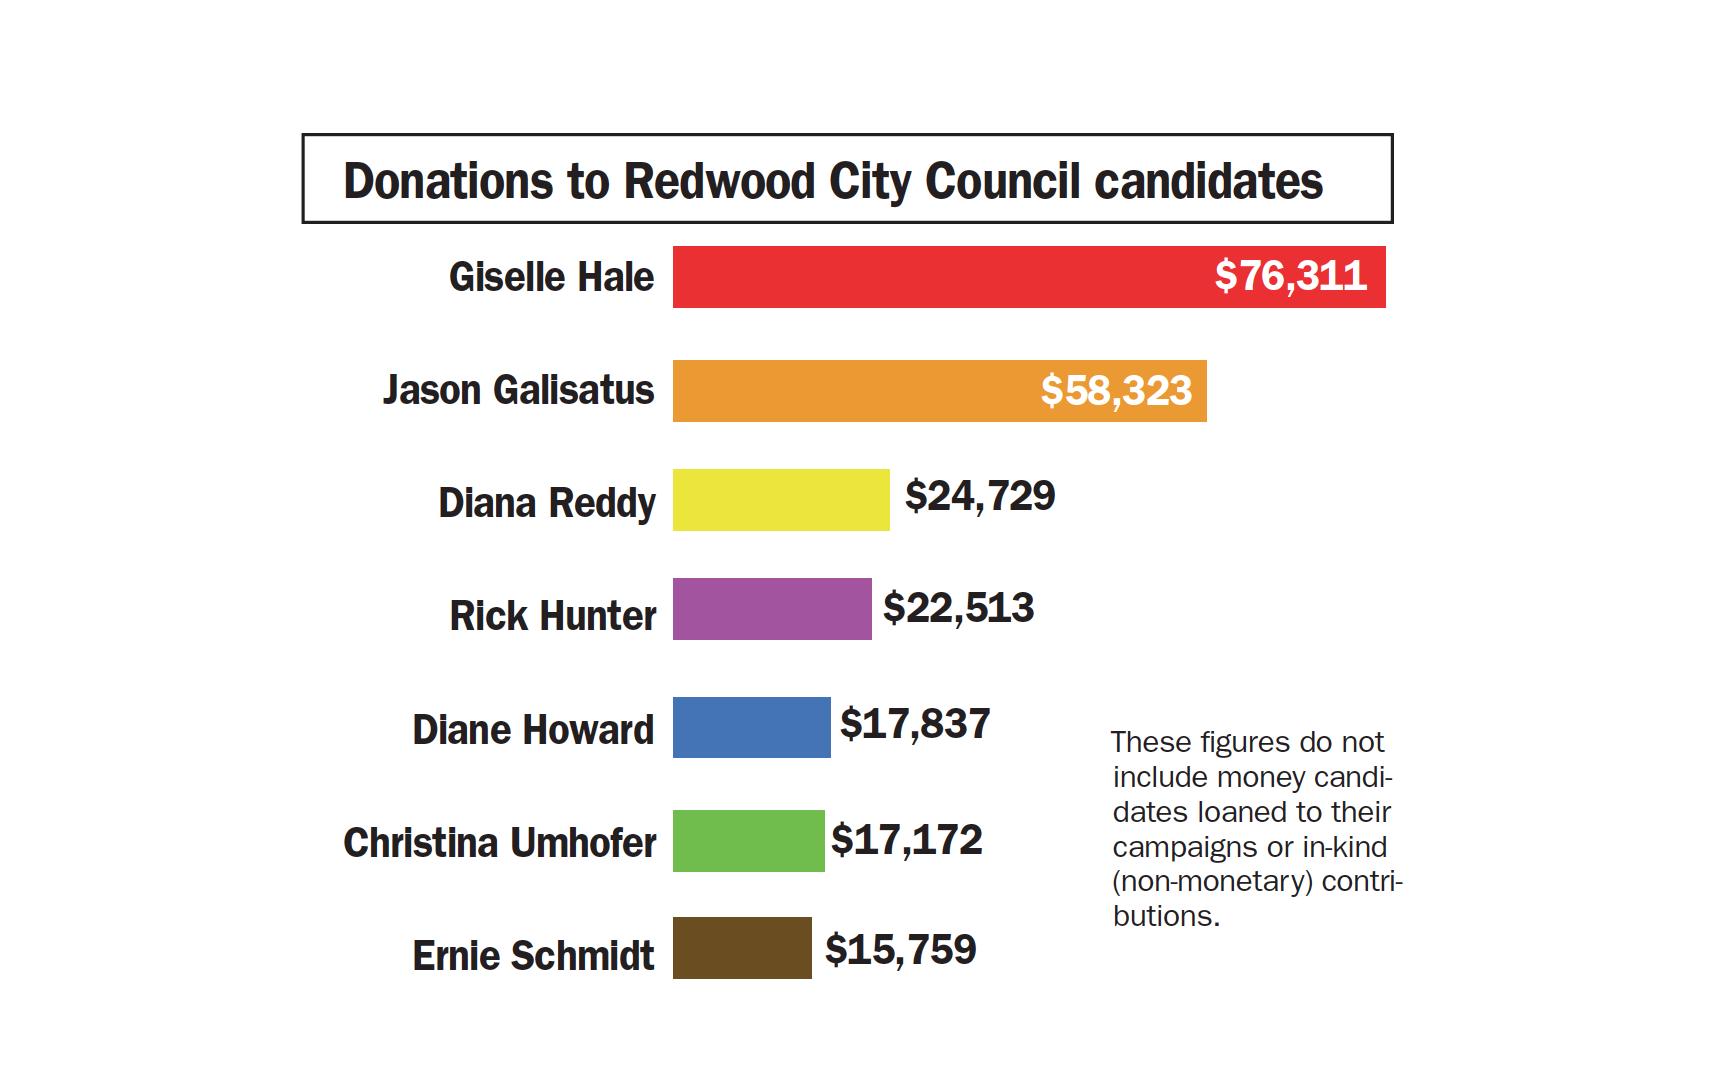 rwc donations